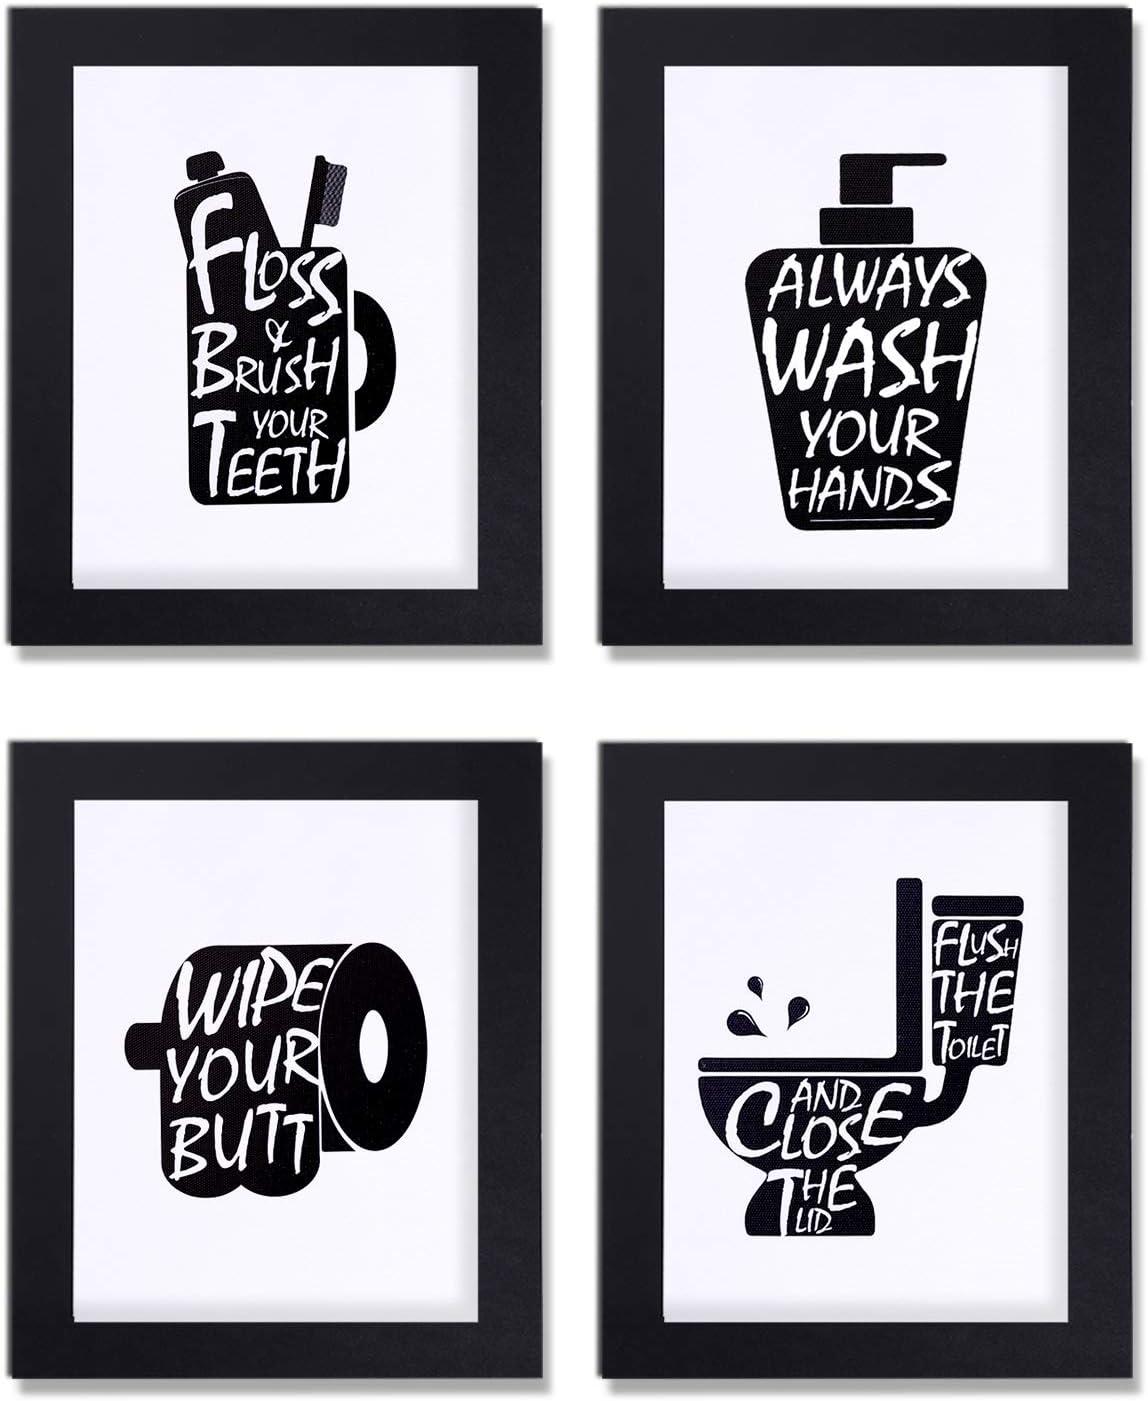 Joysnana Bathroom Decor Wall Art Prints with Frames;Funny Bathroom Sign 8×10 inch Set of 4 (Black and White) (B)